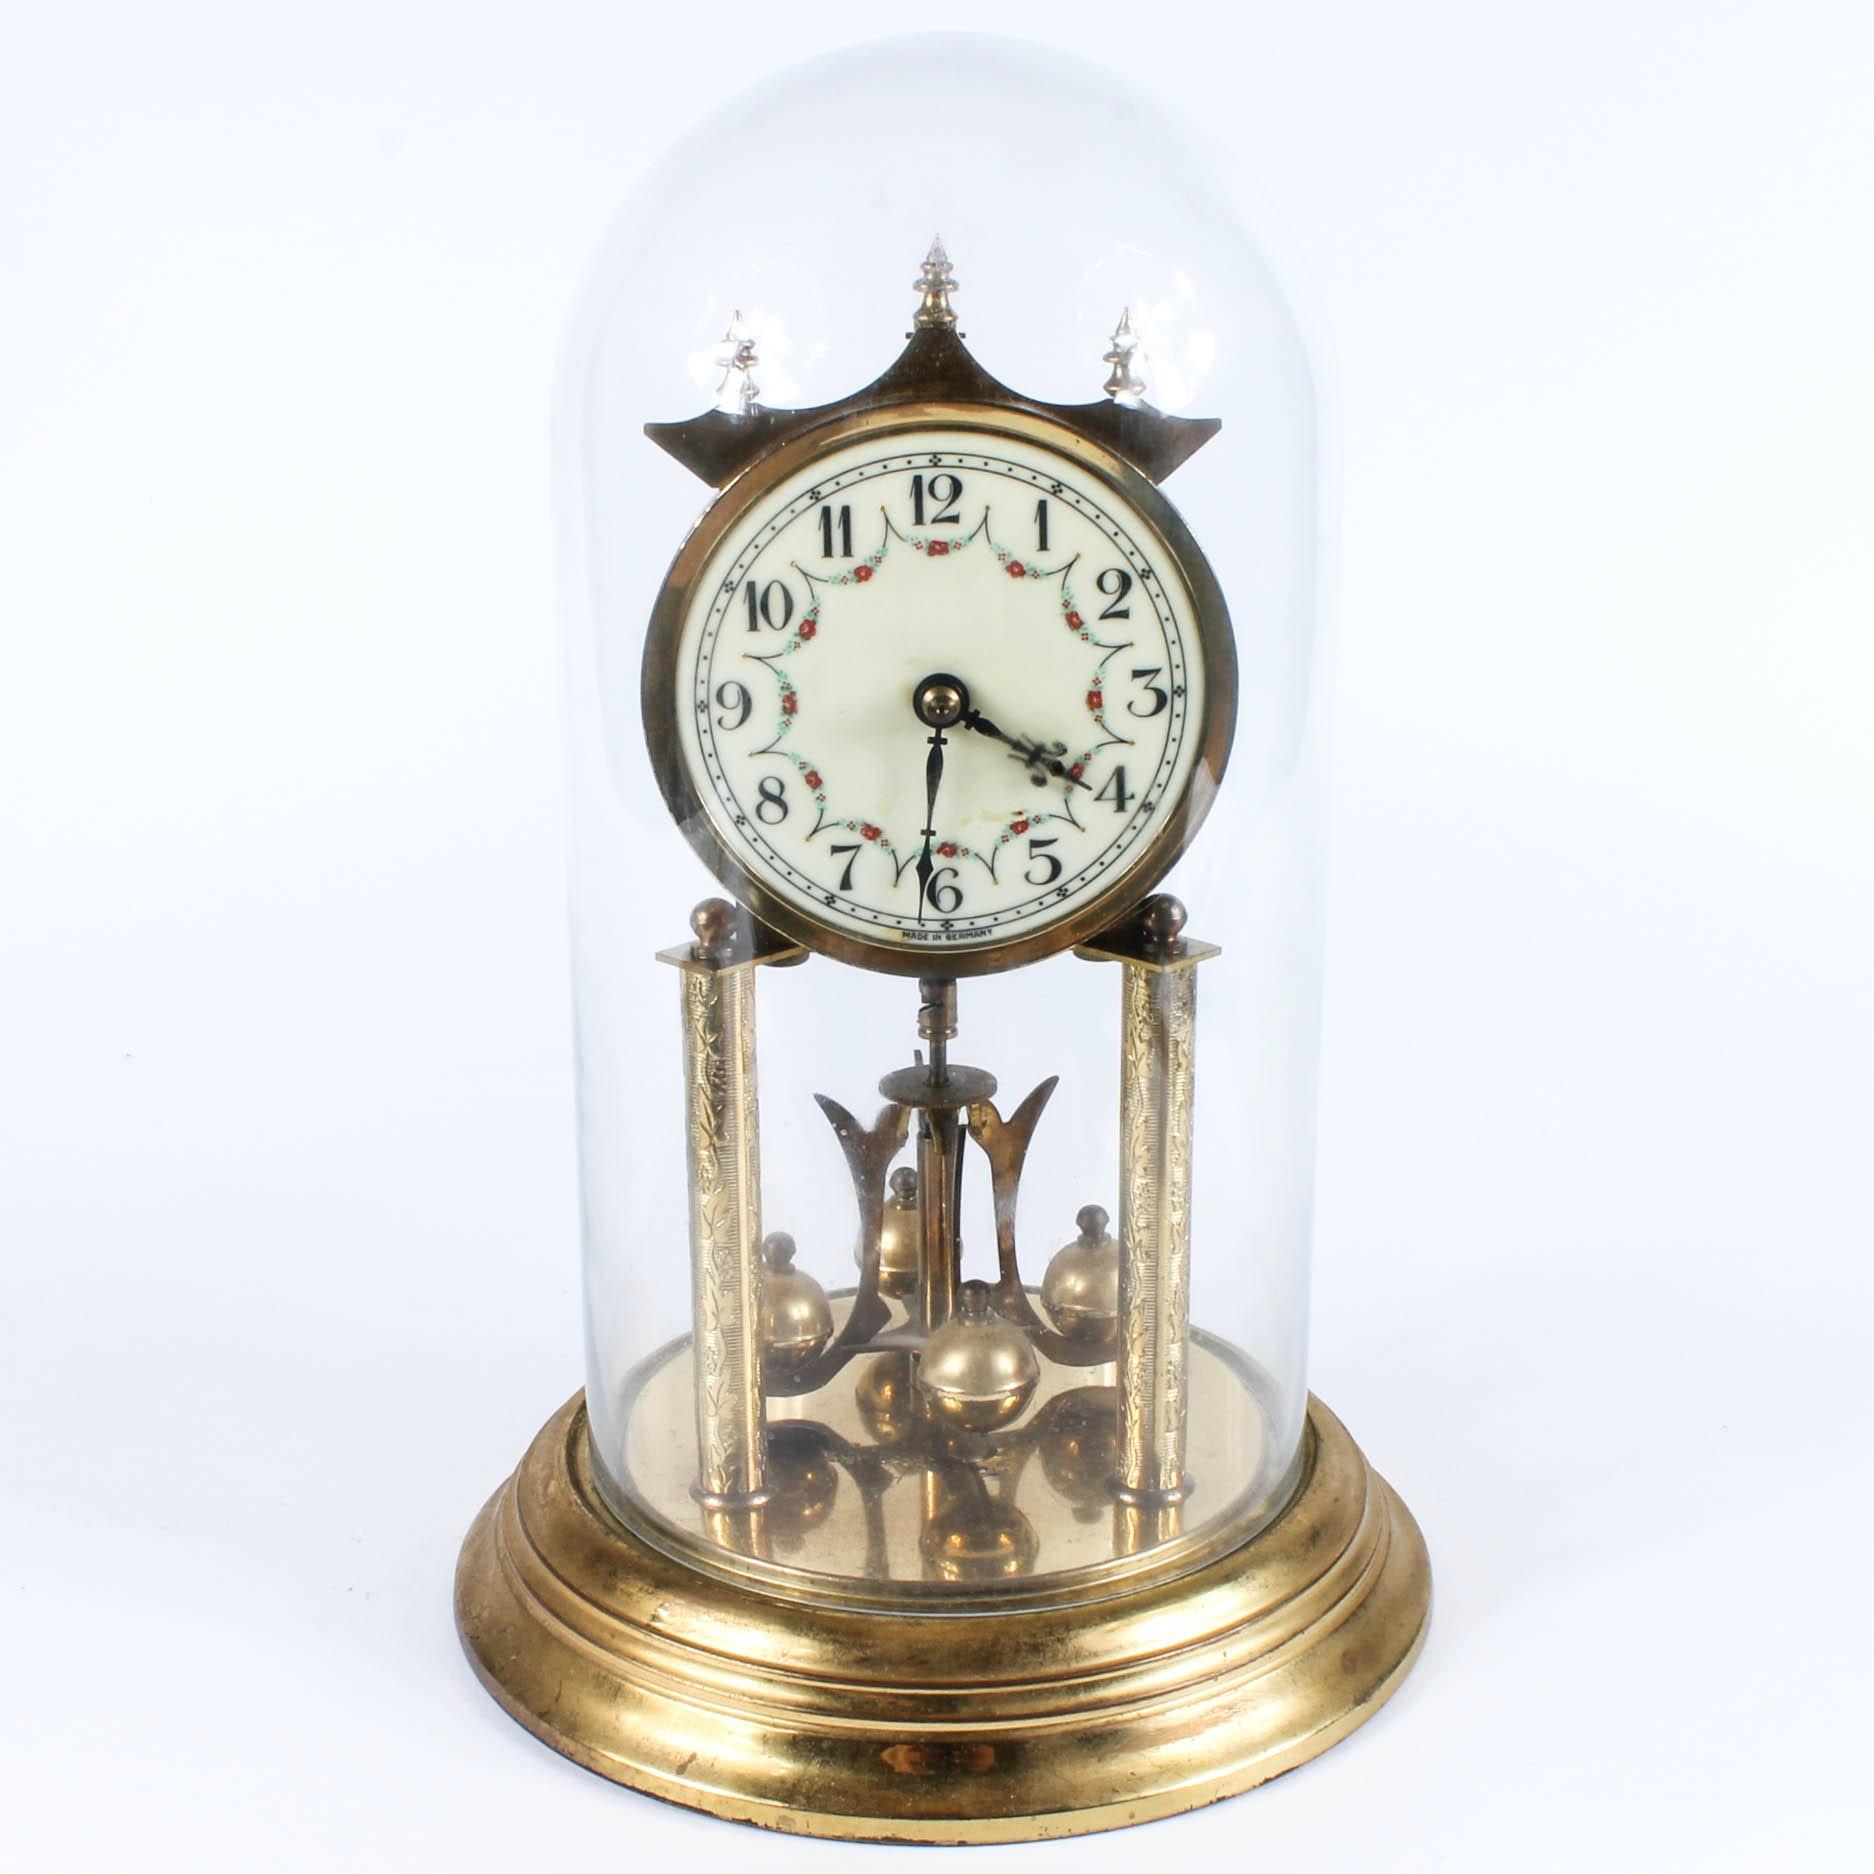 vintage german konrad mauch anniversary clock - Anniversary Clock